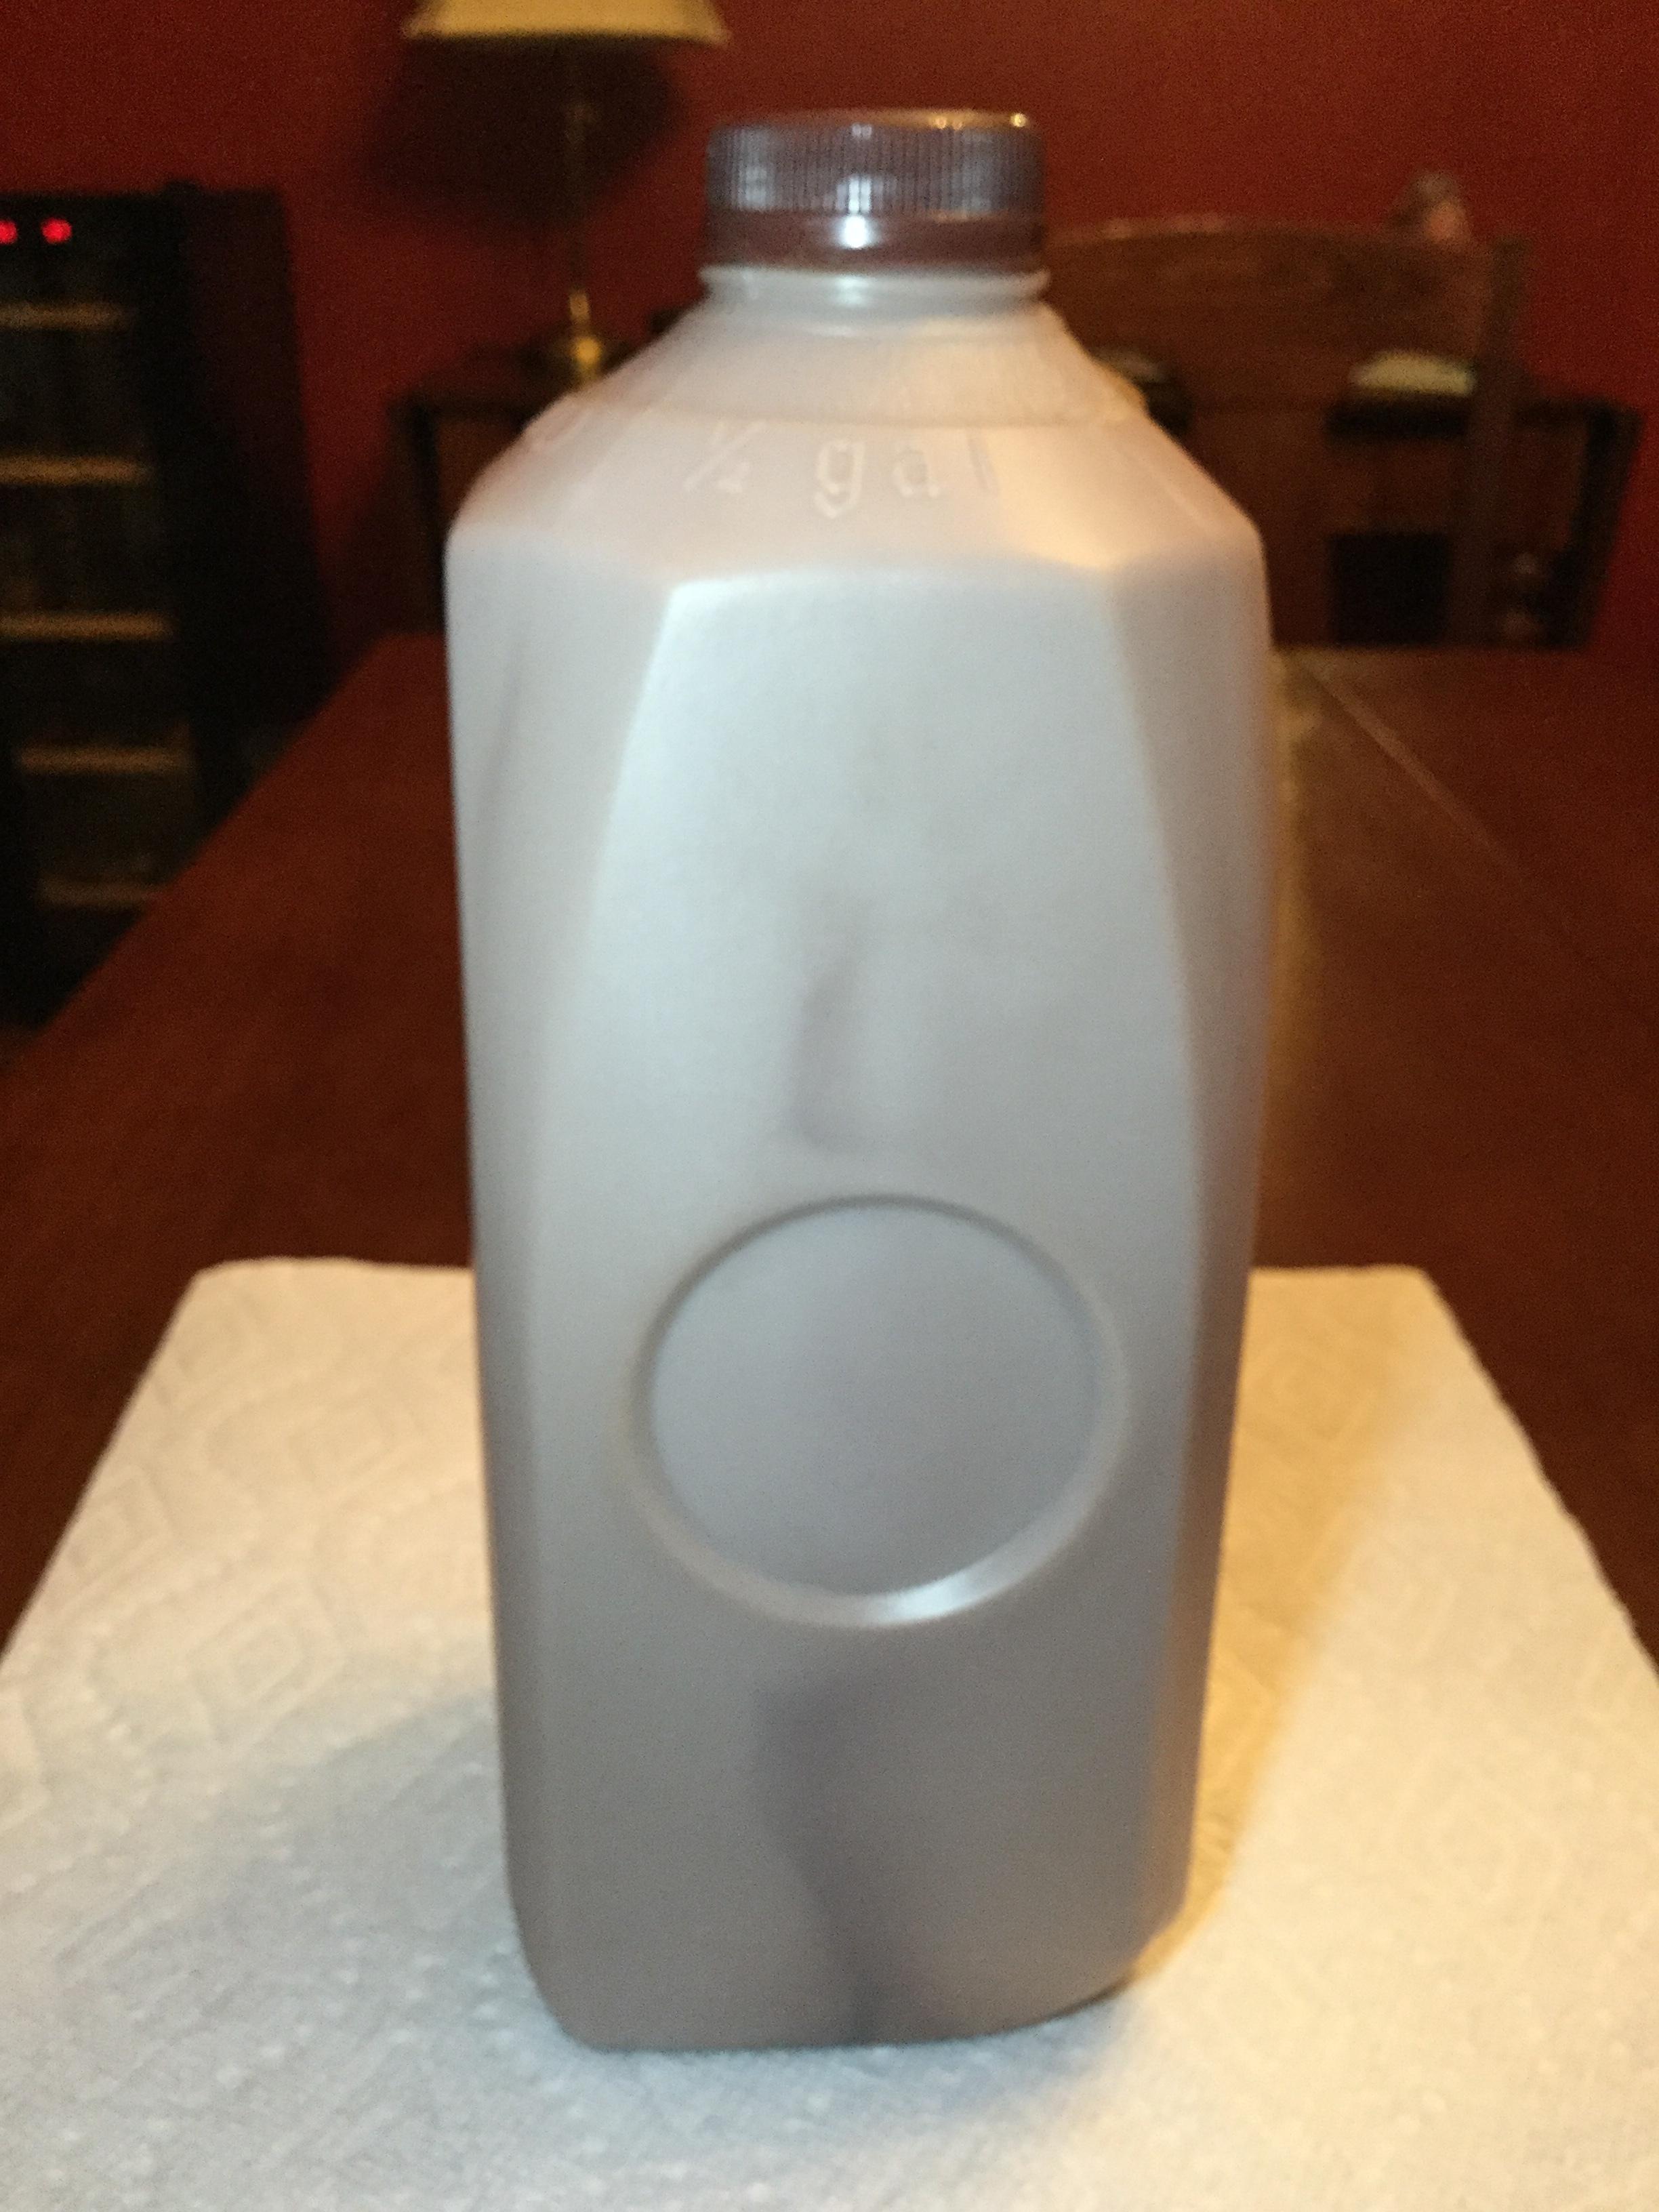 Tops Lowfat Chocolate Milk Side 1